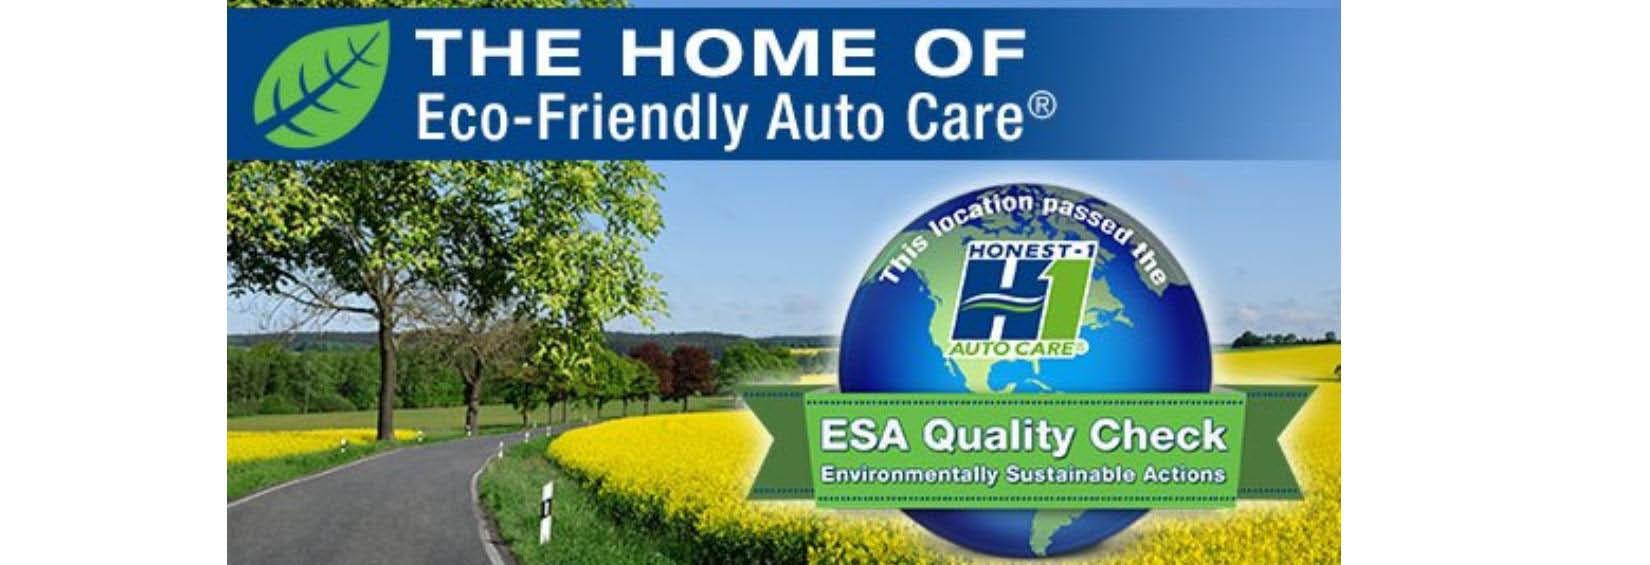 honest-1-auto-care-mckinney-tx-banner